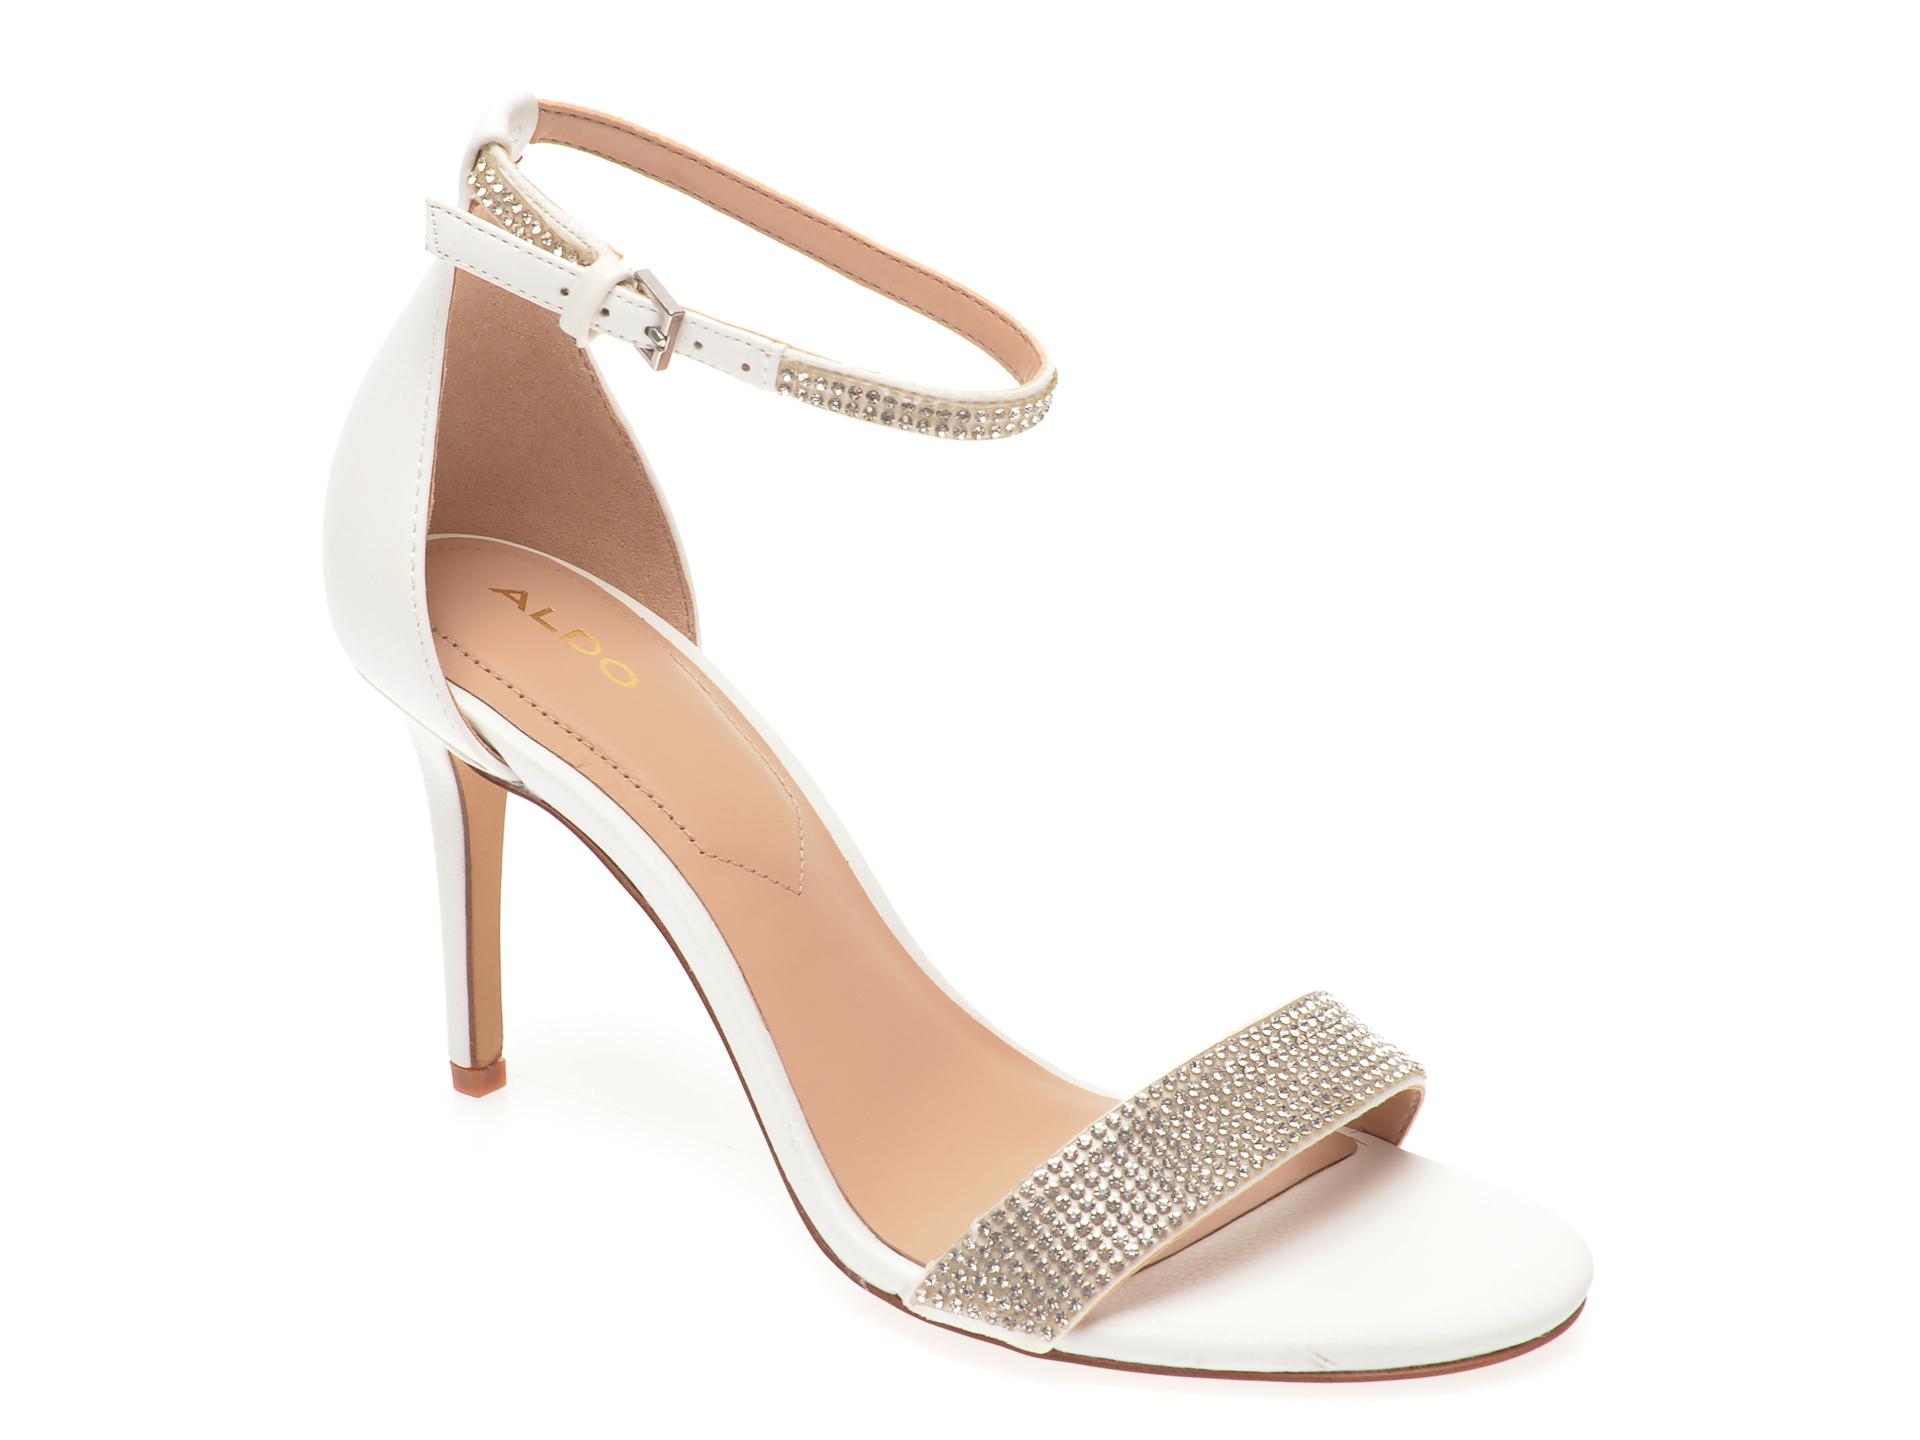 Sandale ALDO albe, Alodien100, din piele ecologica